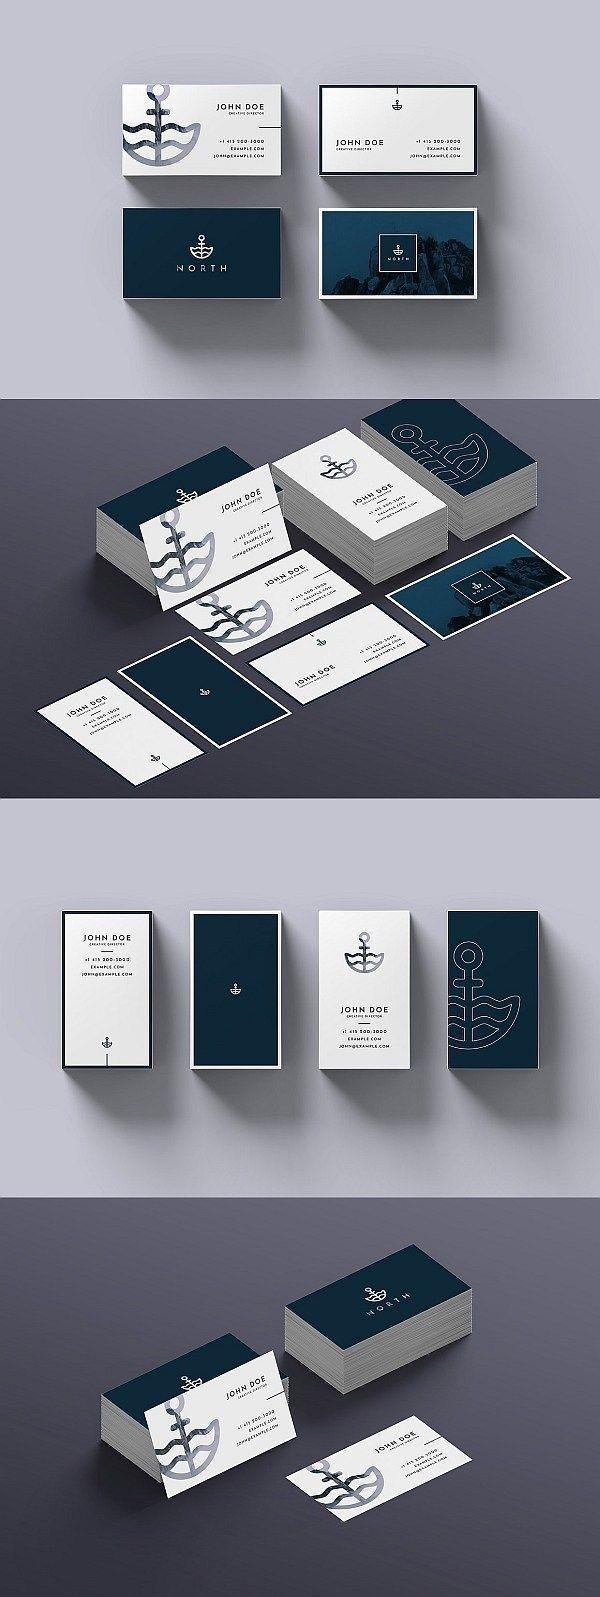 8 Business Card Templates Logo 12 Mockup Scenes Businesscard Design Temp Photography Business Cards Template Business Card Design Unique Business Cards